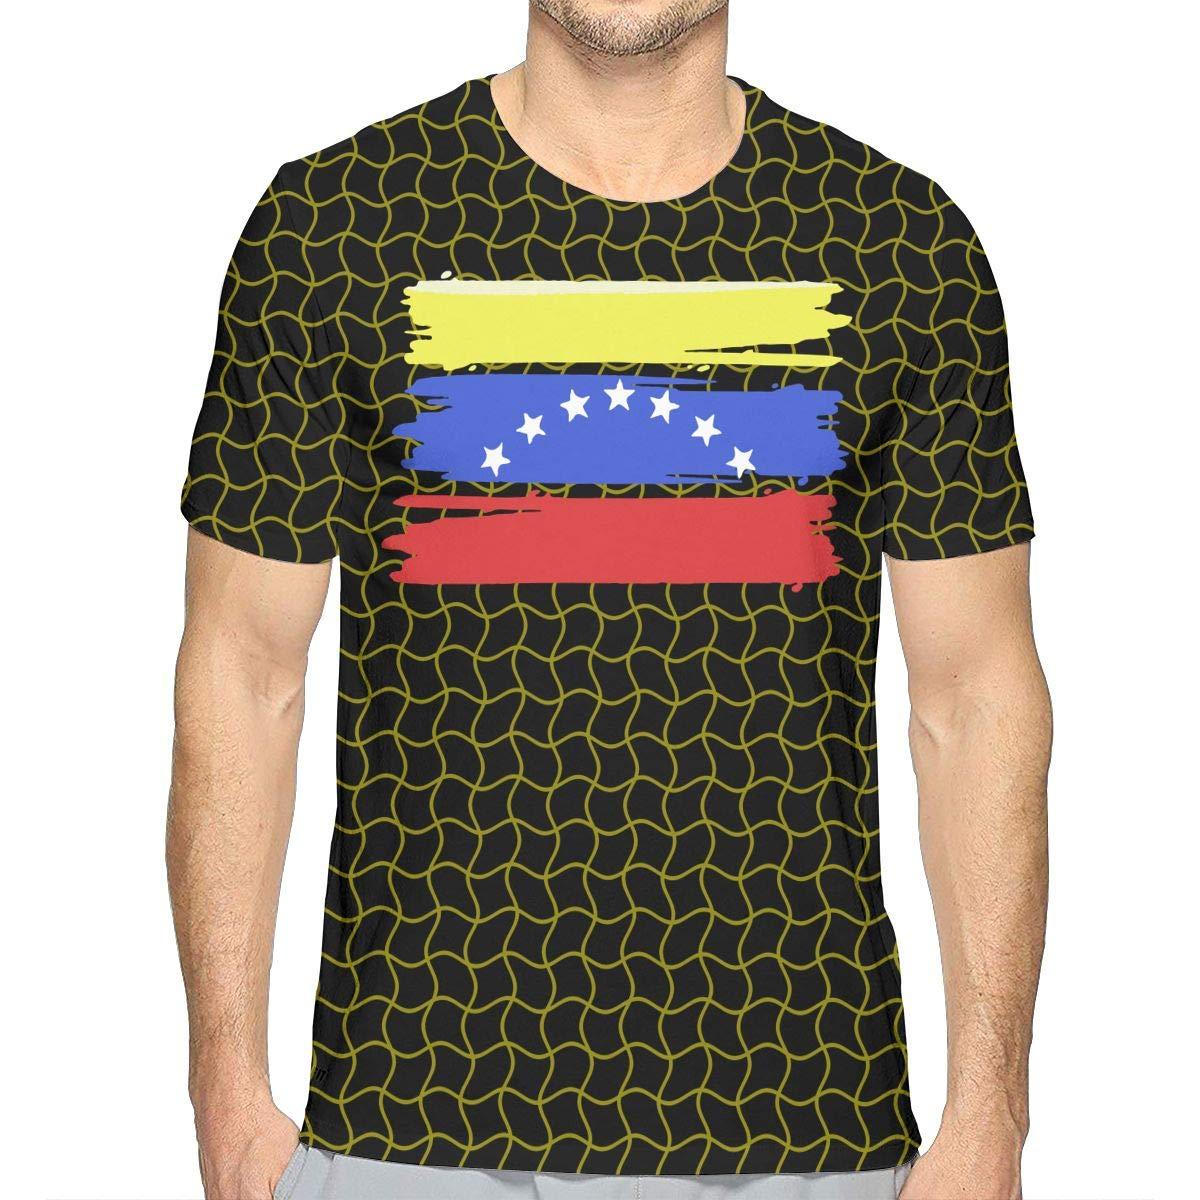 JJKKFG-H Venezuelan Stars Flag Mens Cool Short Sleeve T Shirt